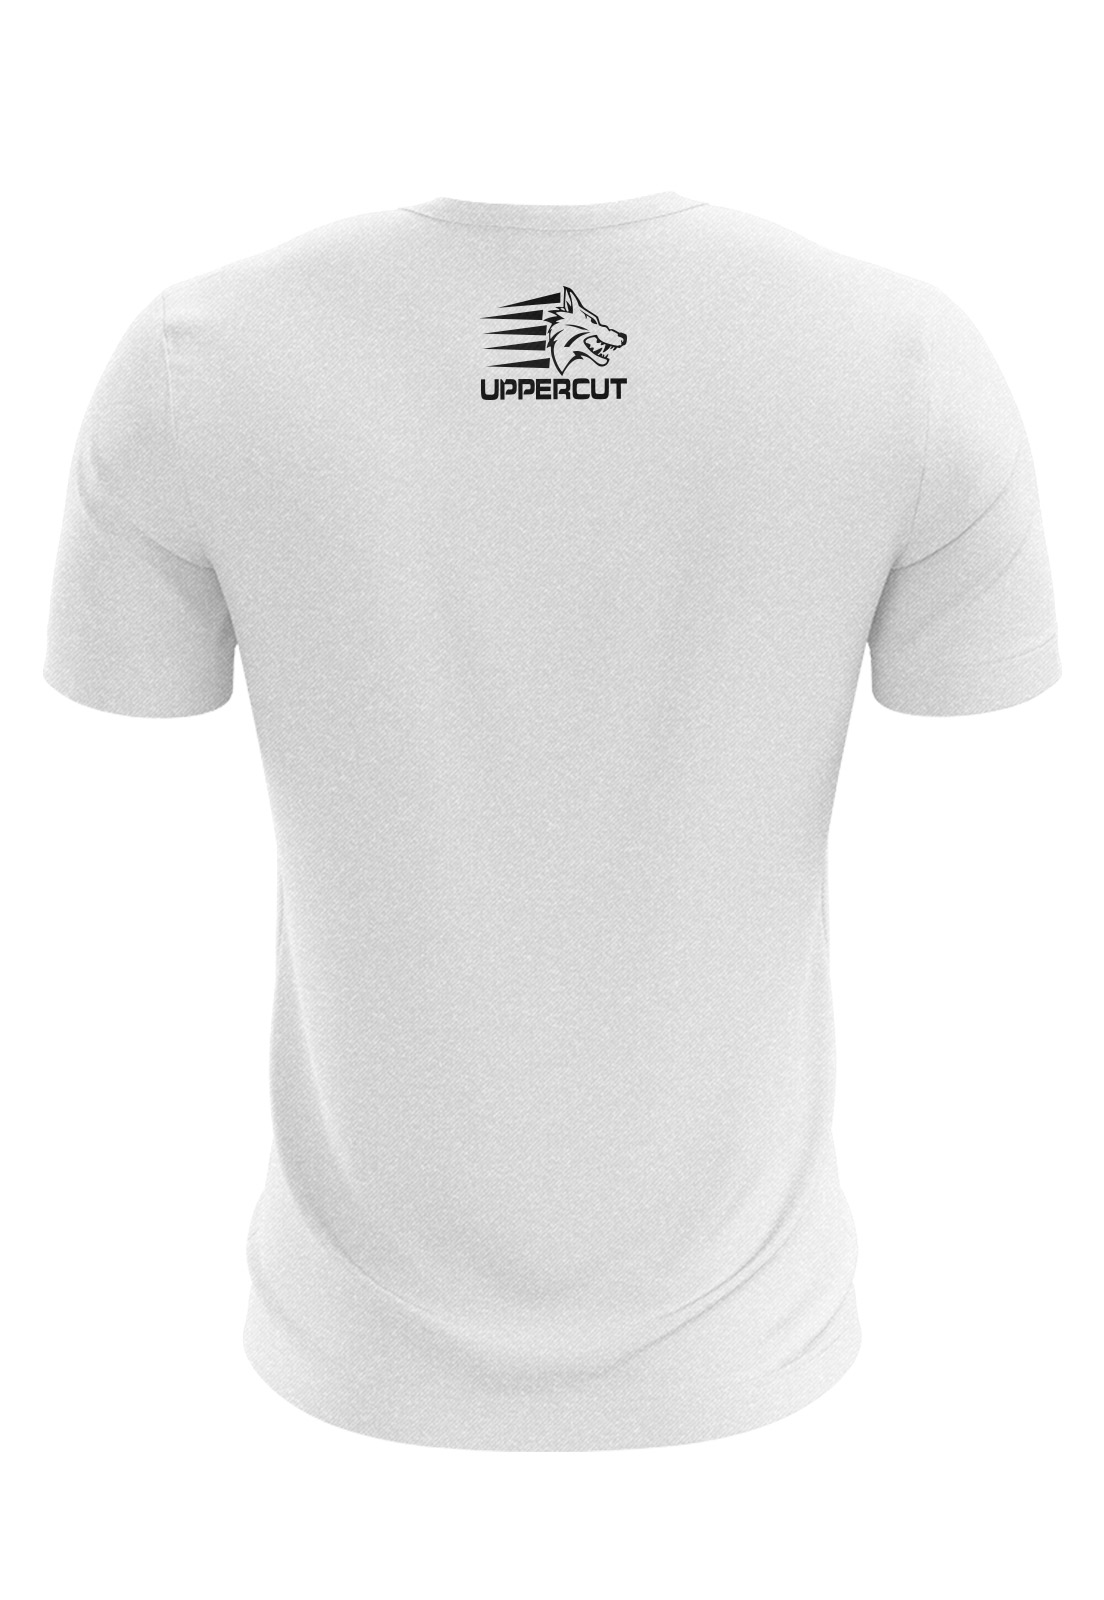 Kit 2 Camisas Dry Fit UV50+ - Ciclismo Bike - Kt49